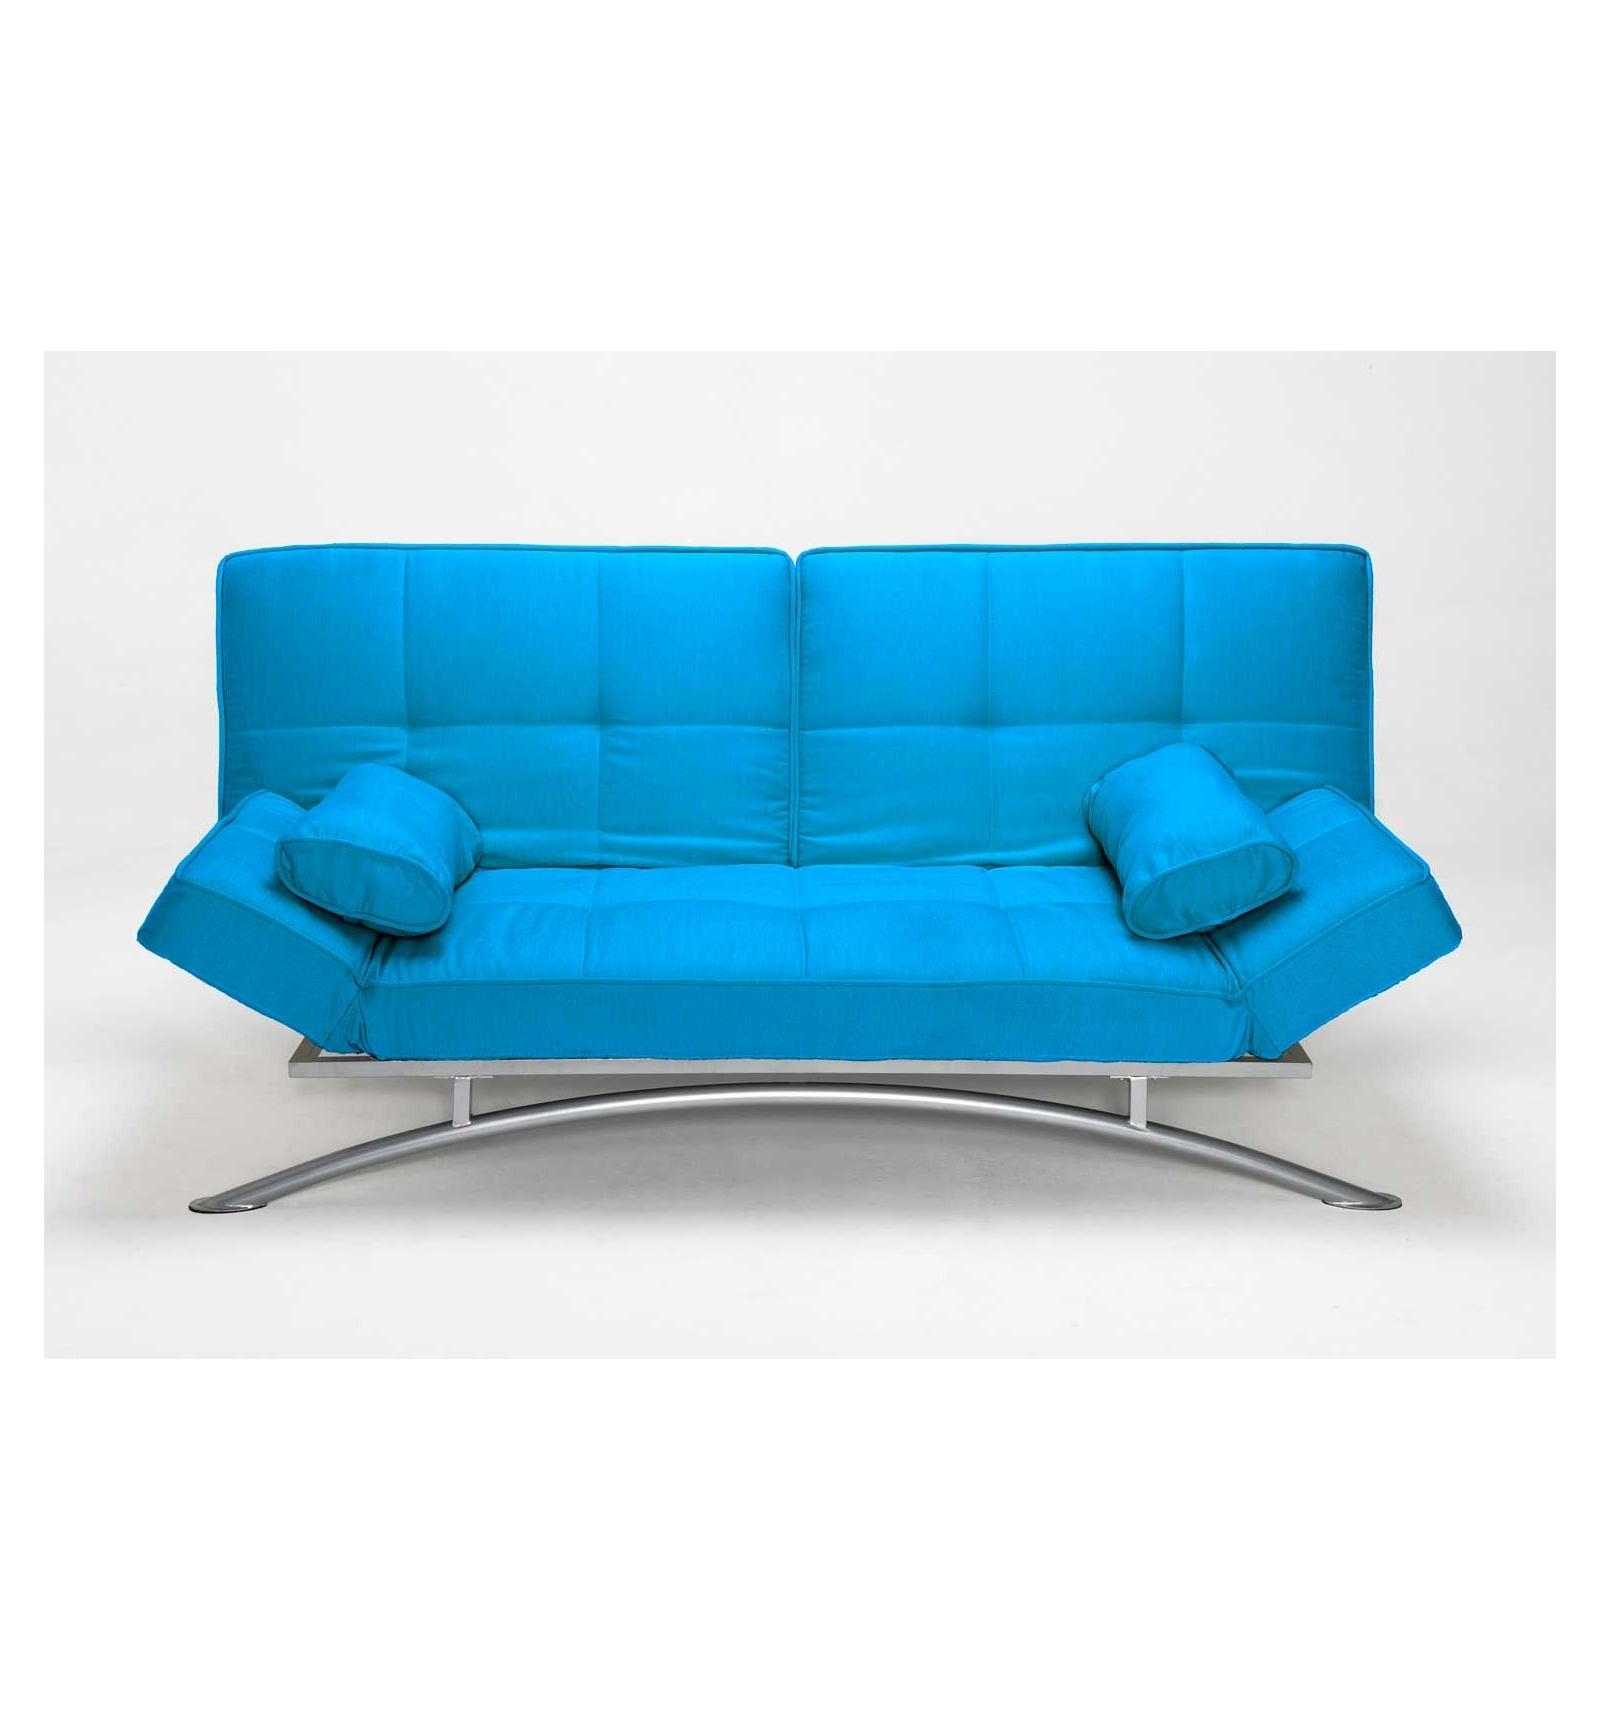 banquette convertible. Black Bedroom Furniture Sets. Home Design Ideas